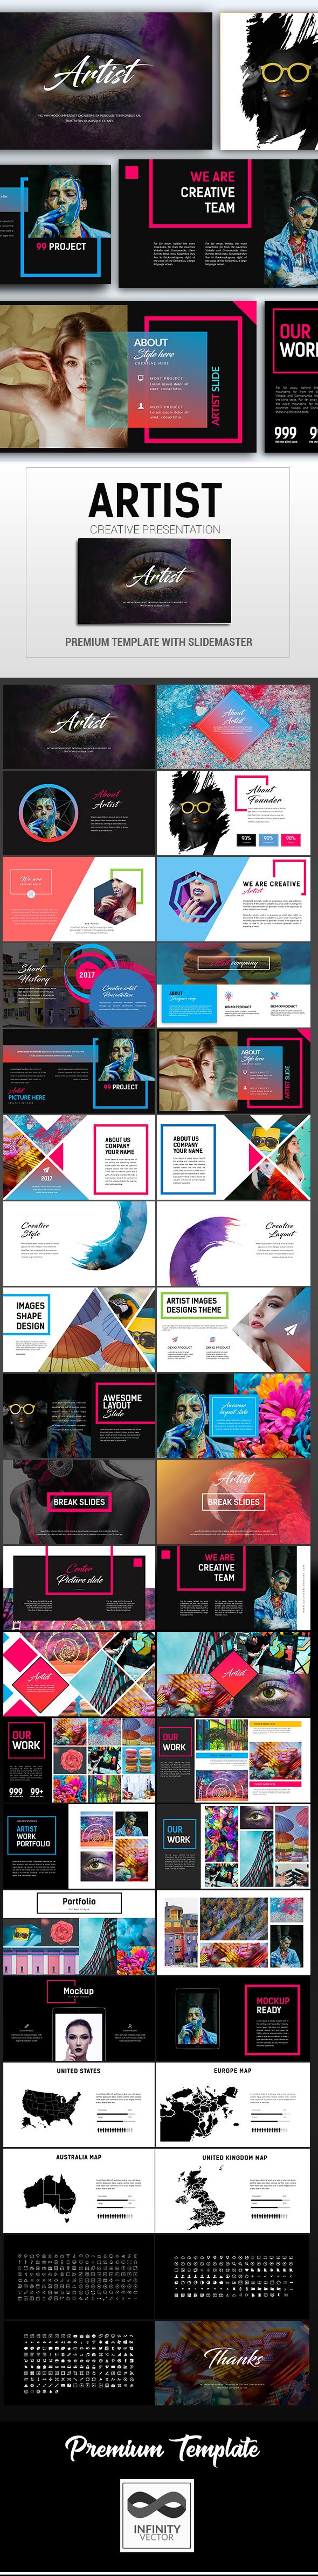 Artist Creative Presentation Keynote - Keynote Templates Presentation Templates